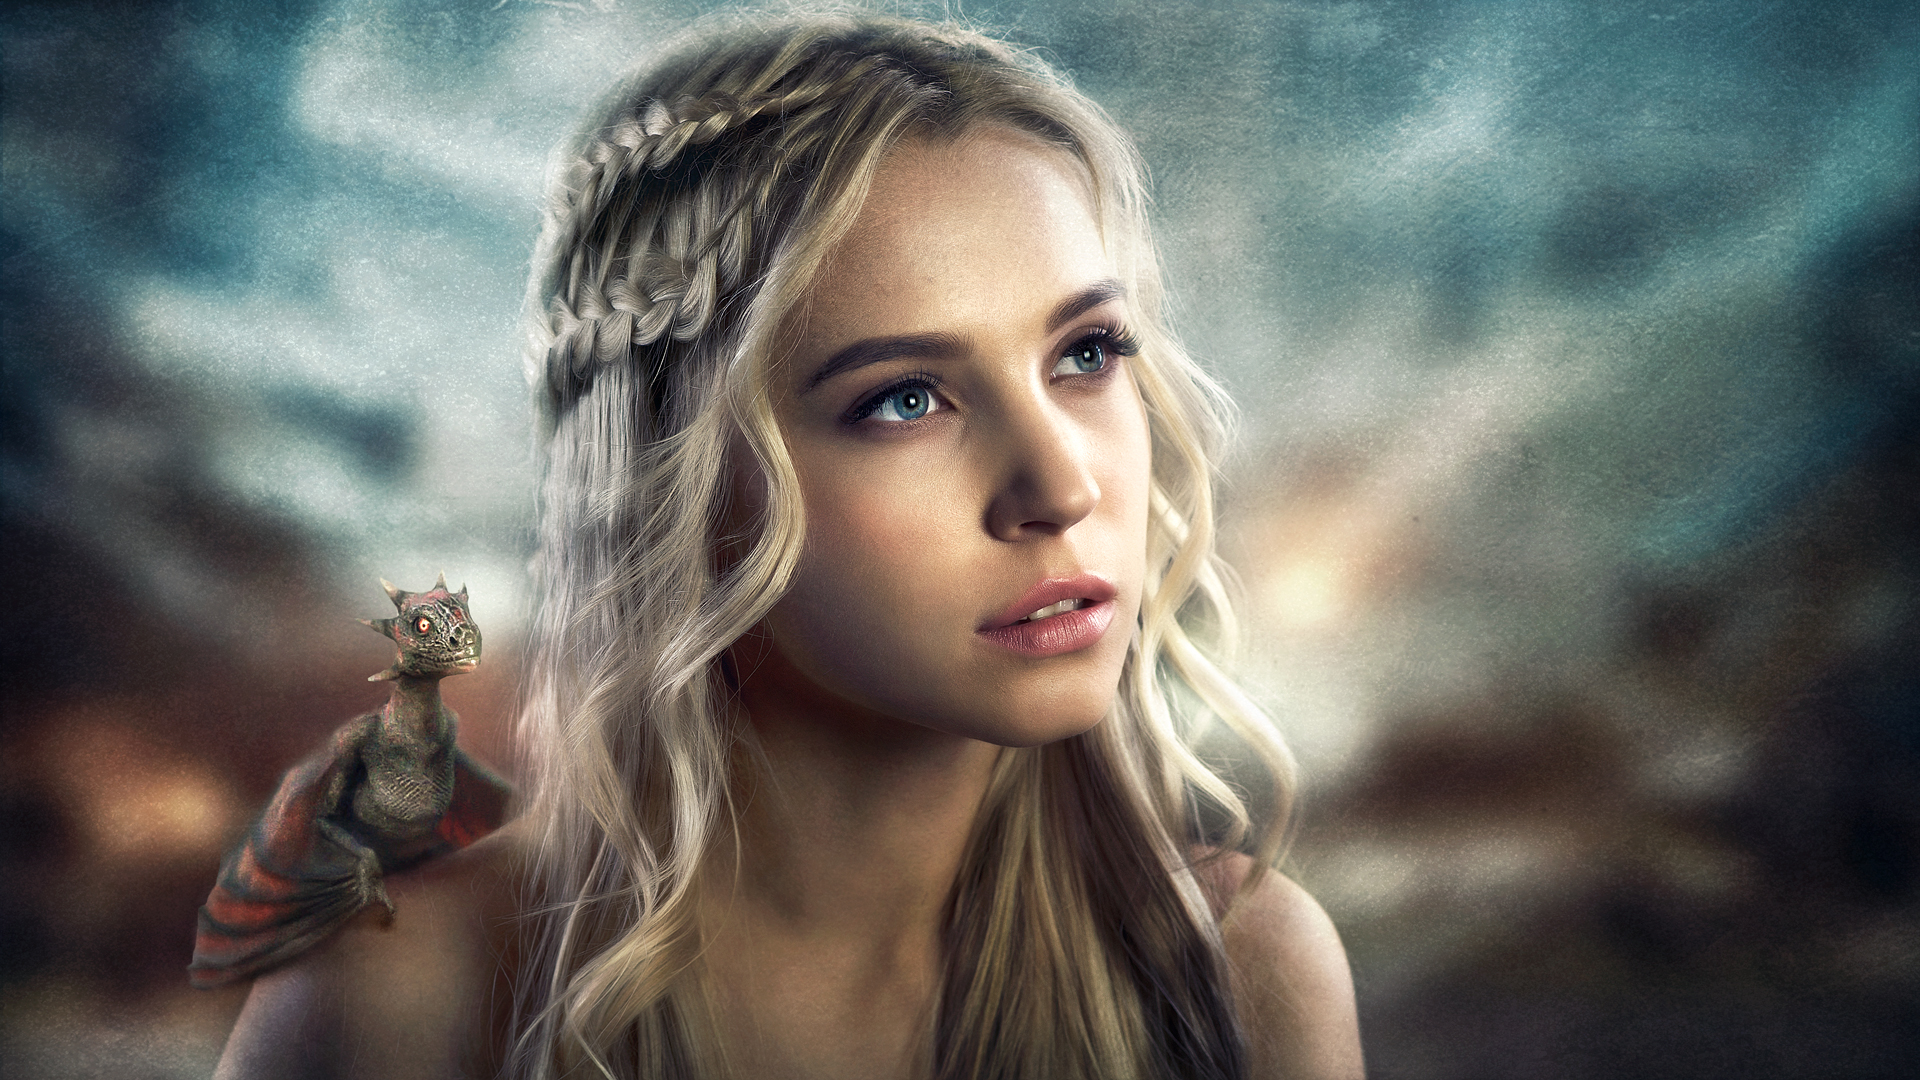 Девушка с драконом фото